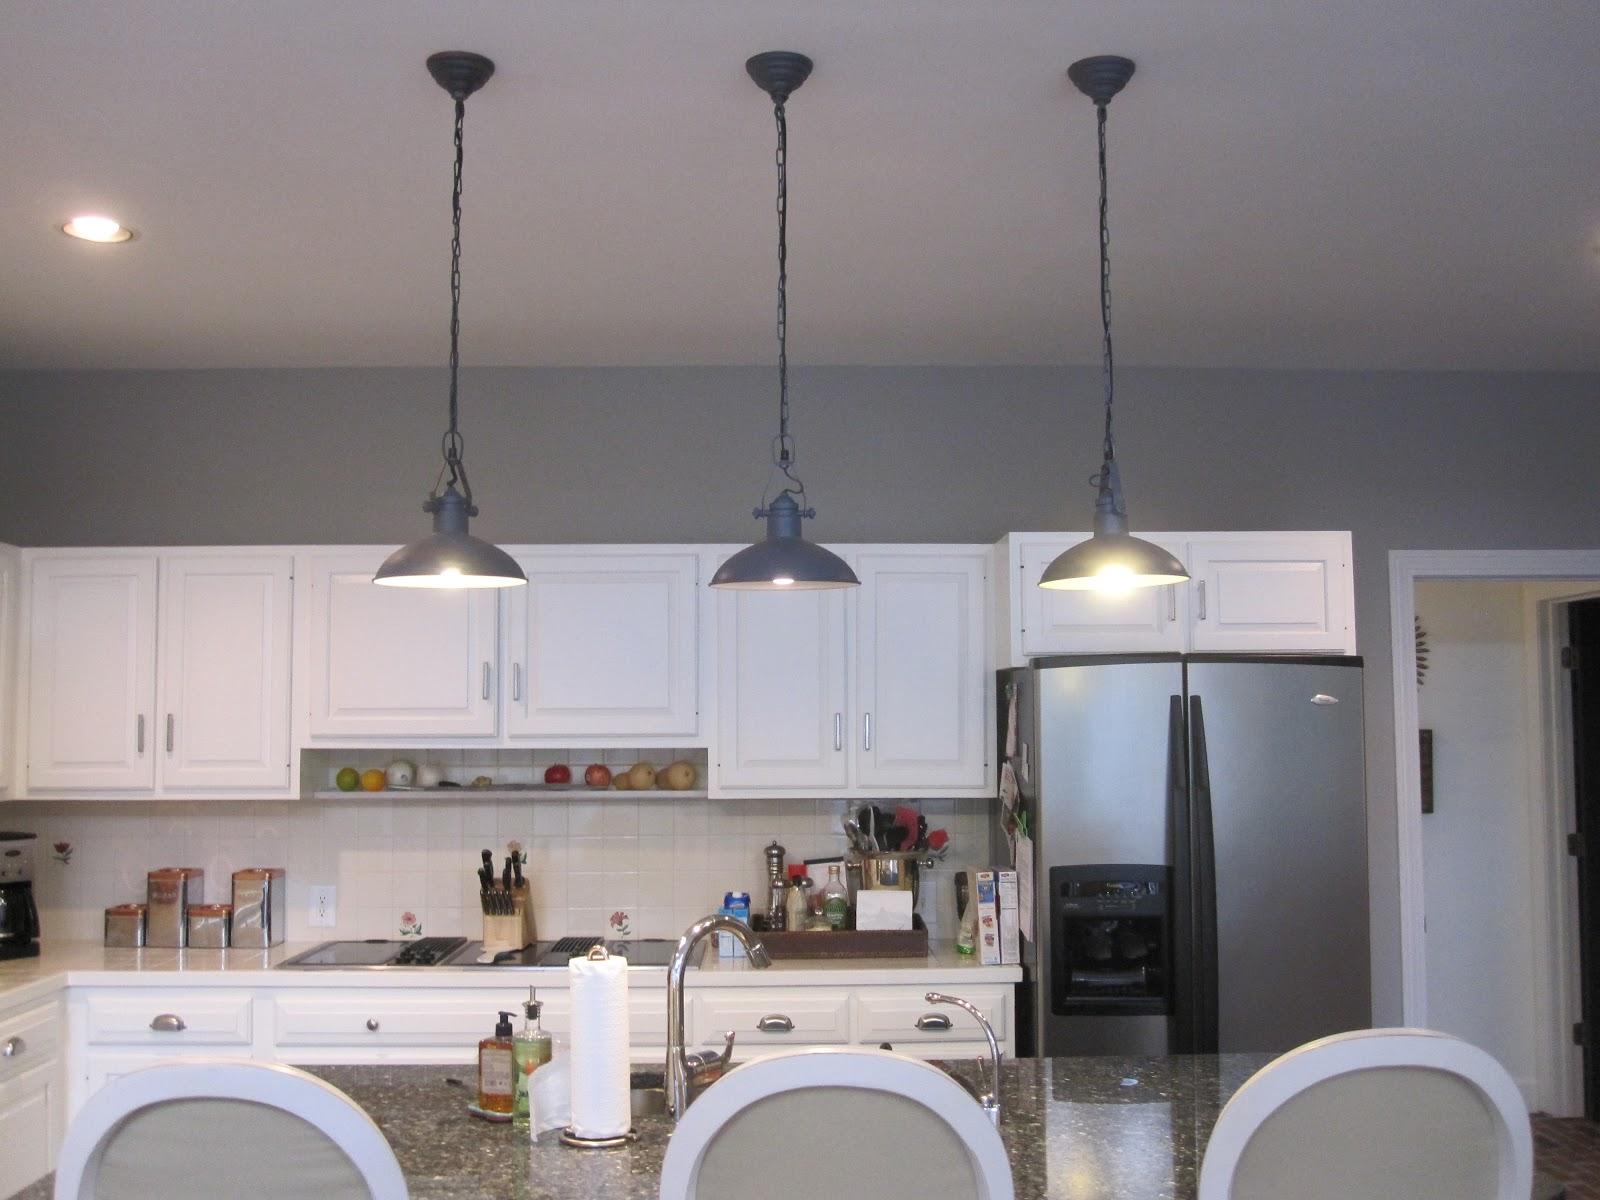 Vintage Kitchen Island Unique Design Retro Kitchen Design Ideas Beautiful Center Island Kitchen Lighting